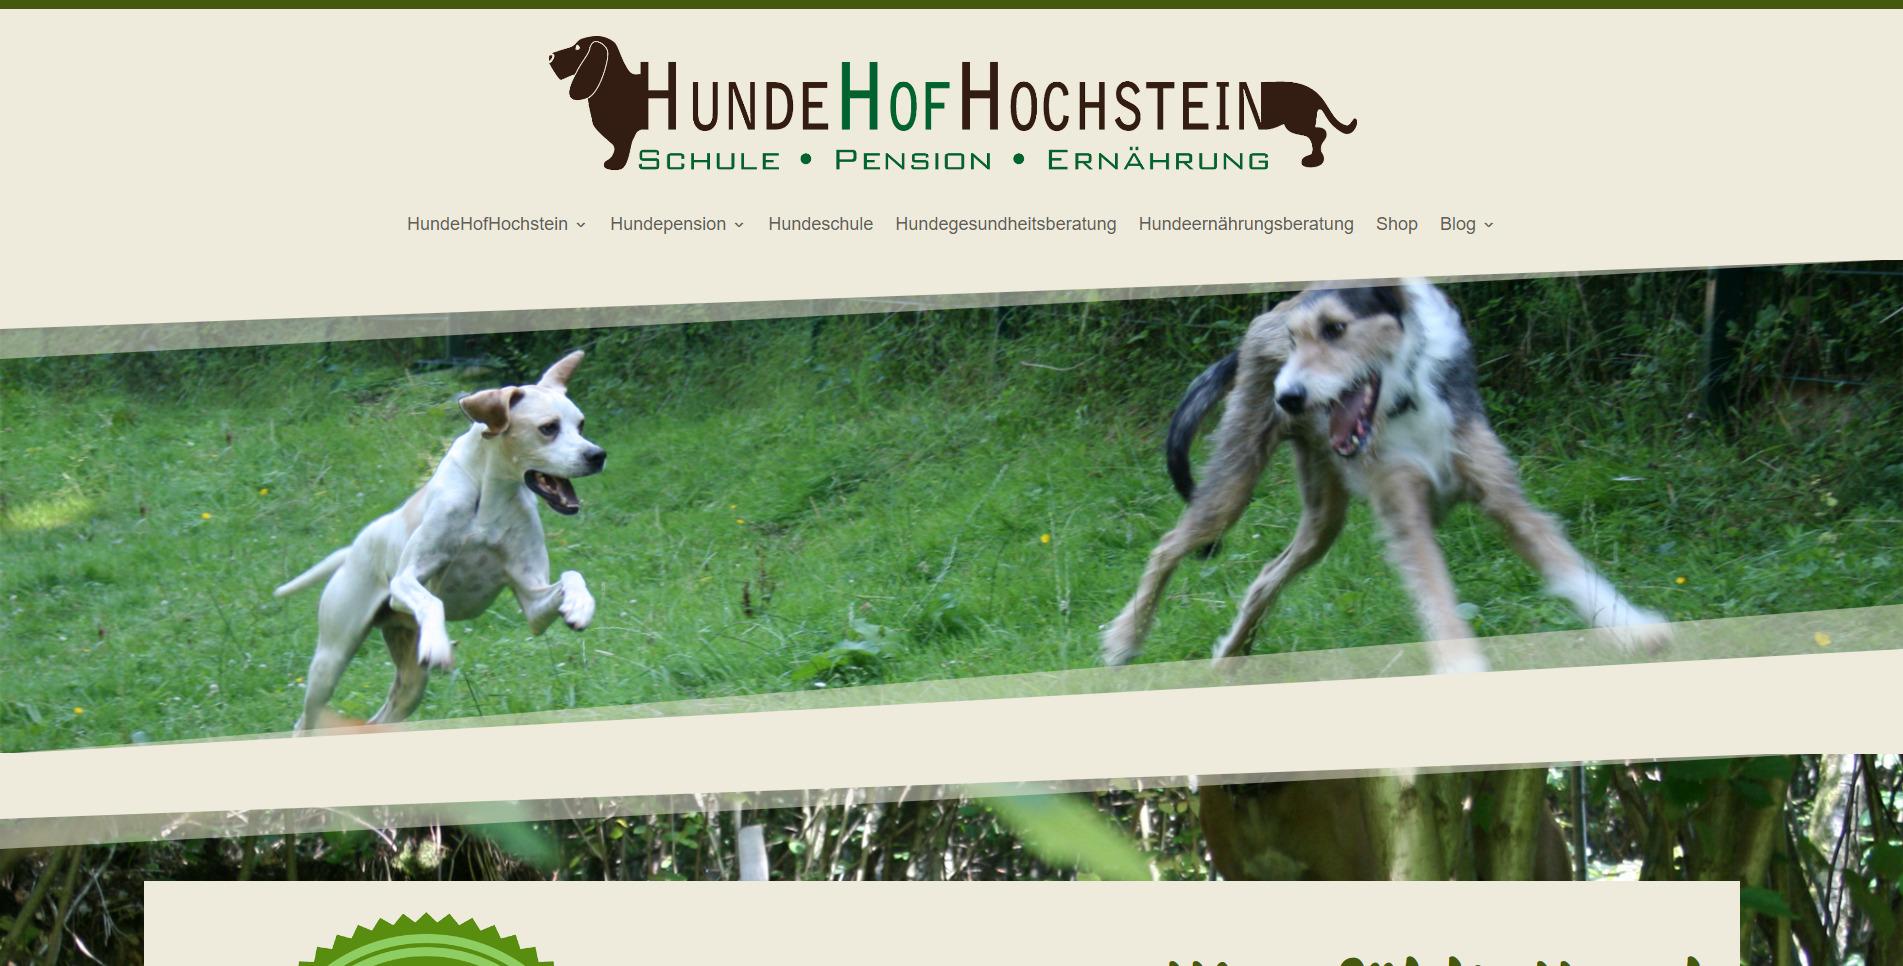 HundeHofHochstein